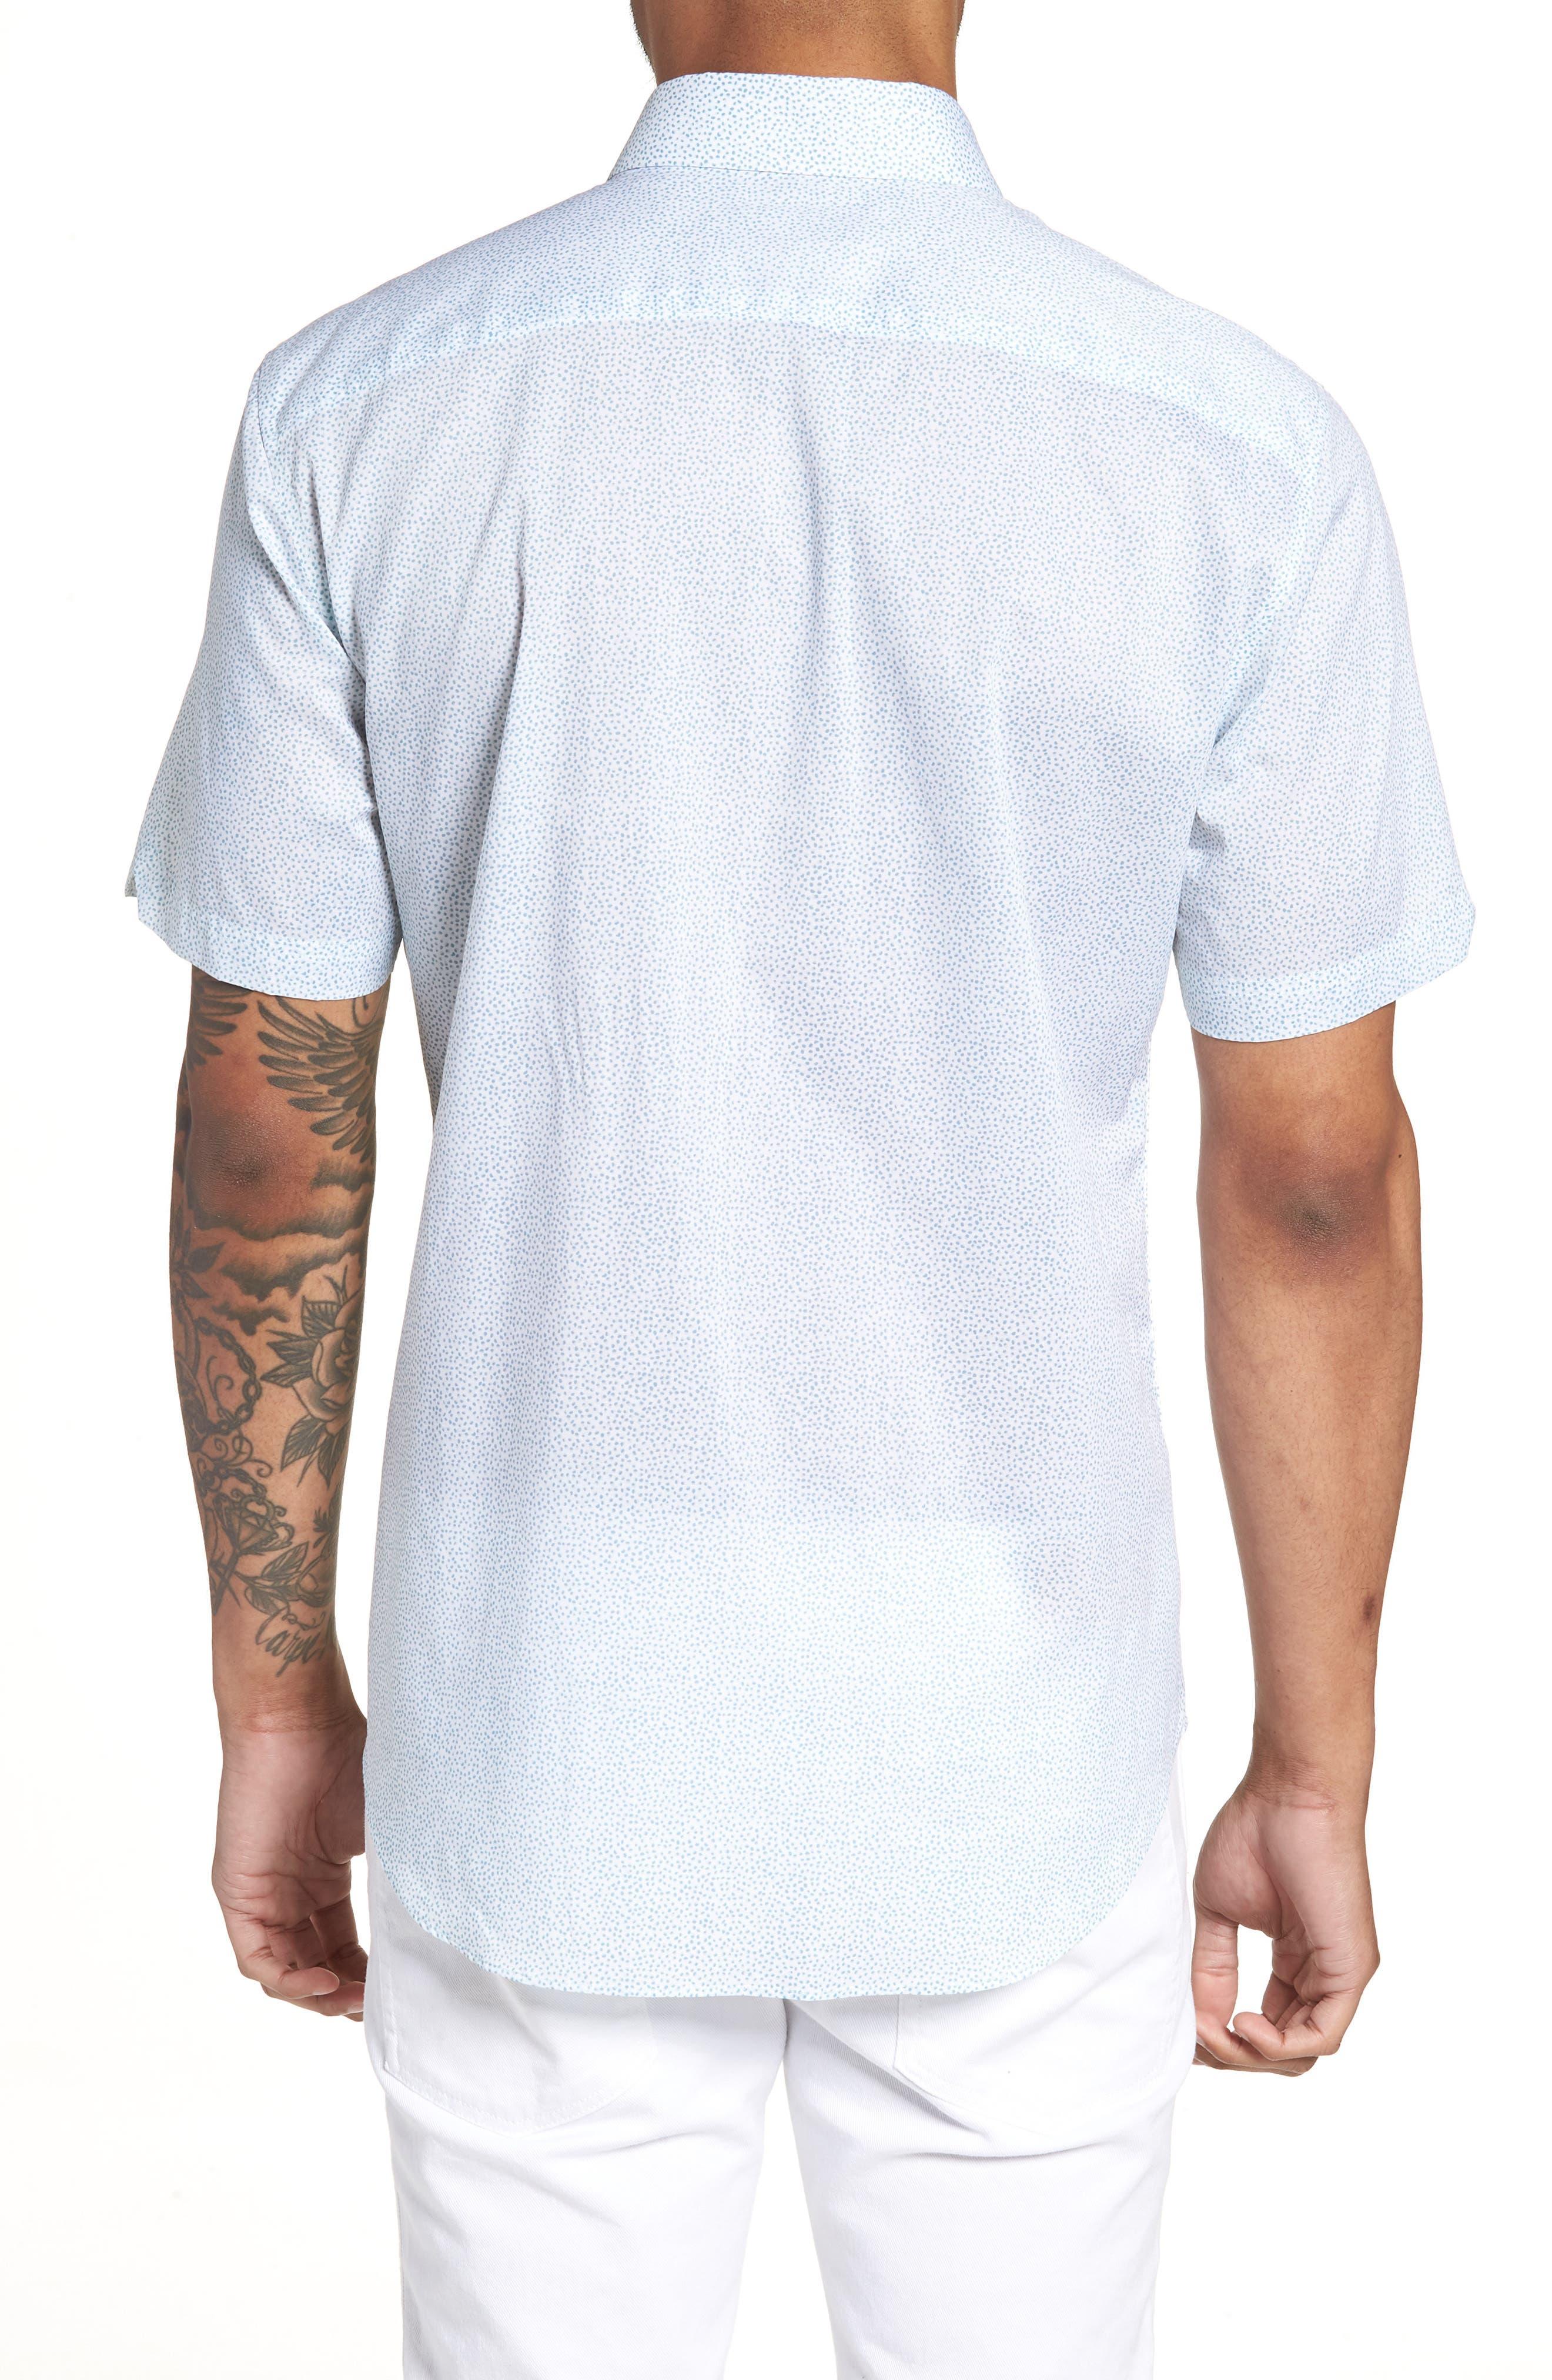 Fung Regular Fit Sport Shirt,                             Alternate thumbnail 2, color,                             WHITE